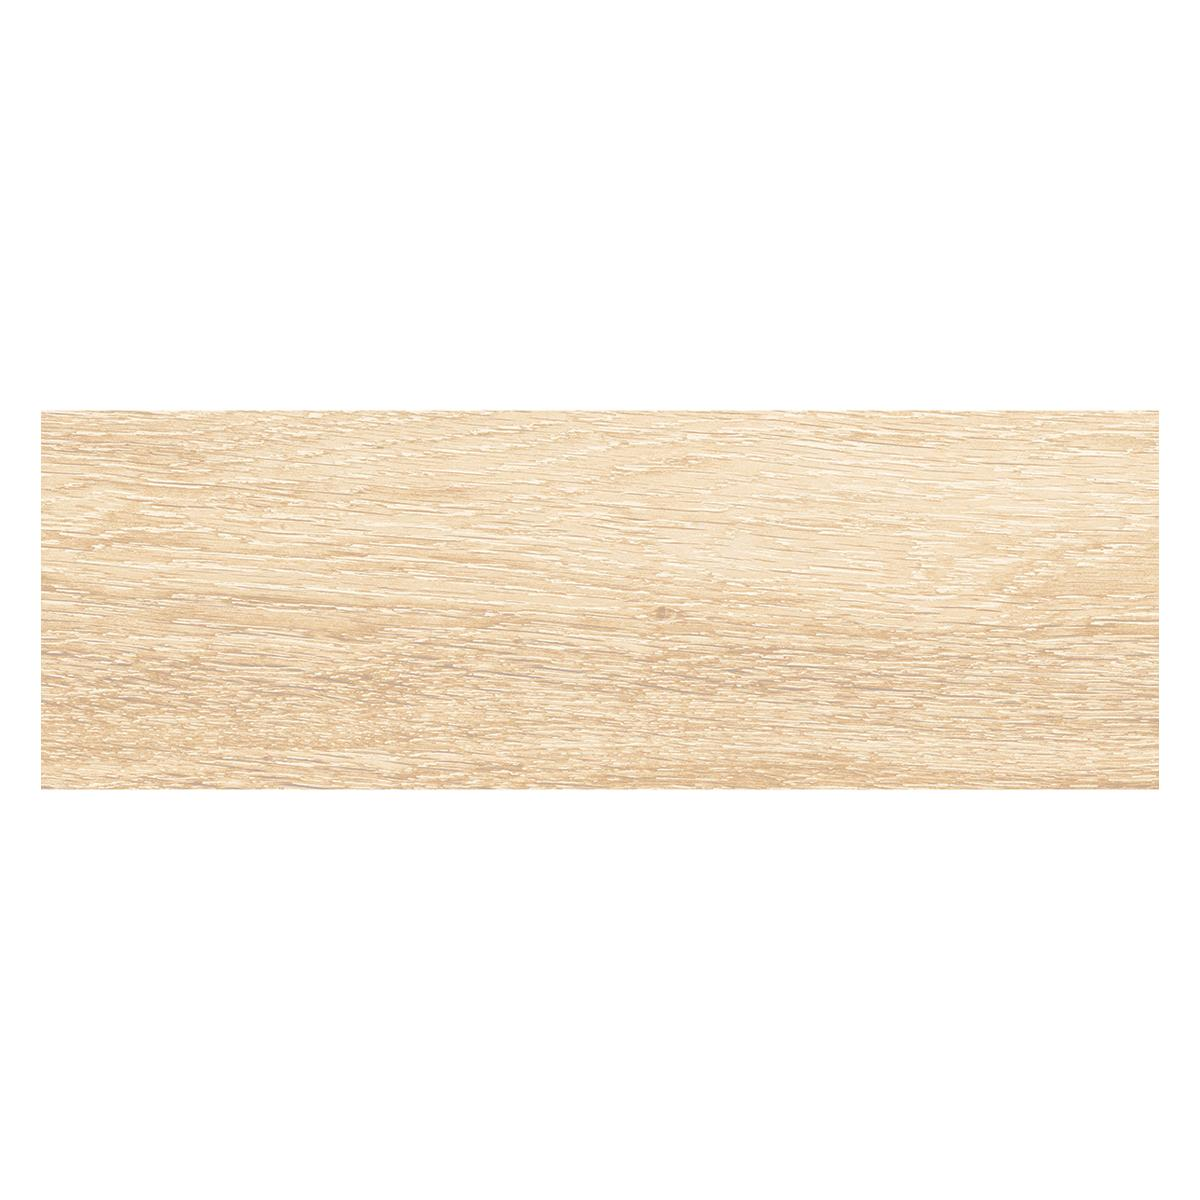 Piso Marfil Marfil Mate - 20X60 cm - 1.44 m2